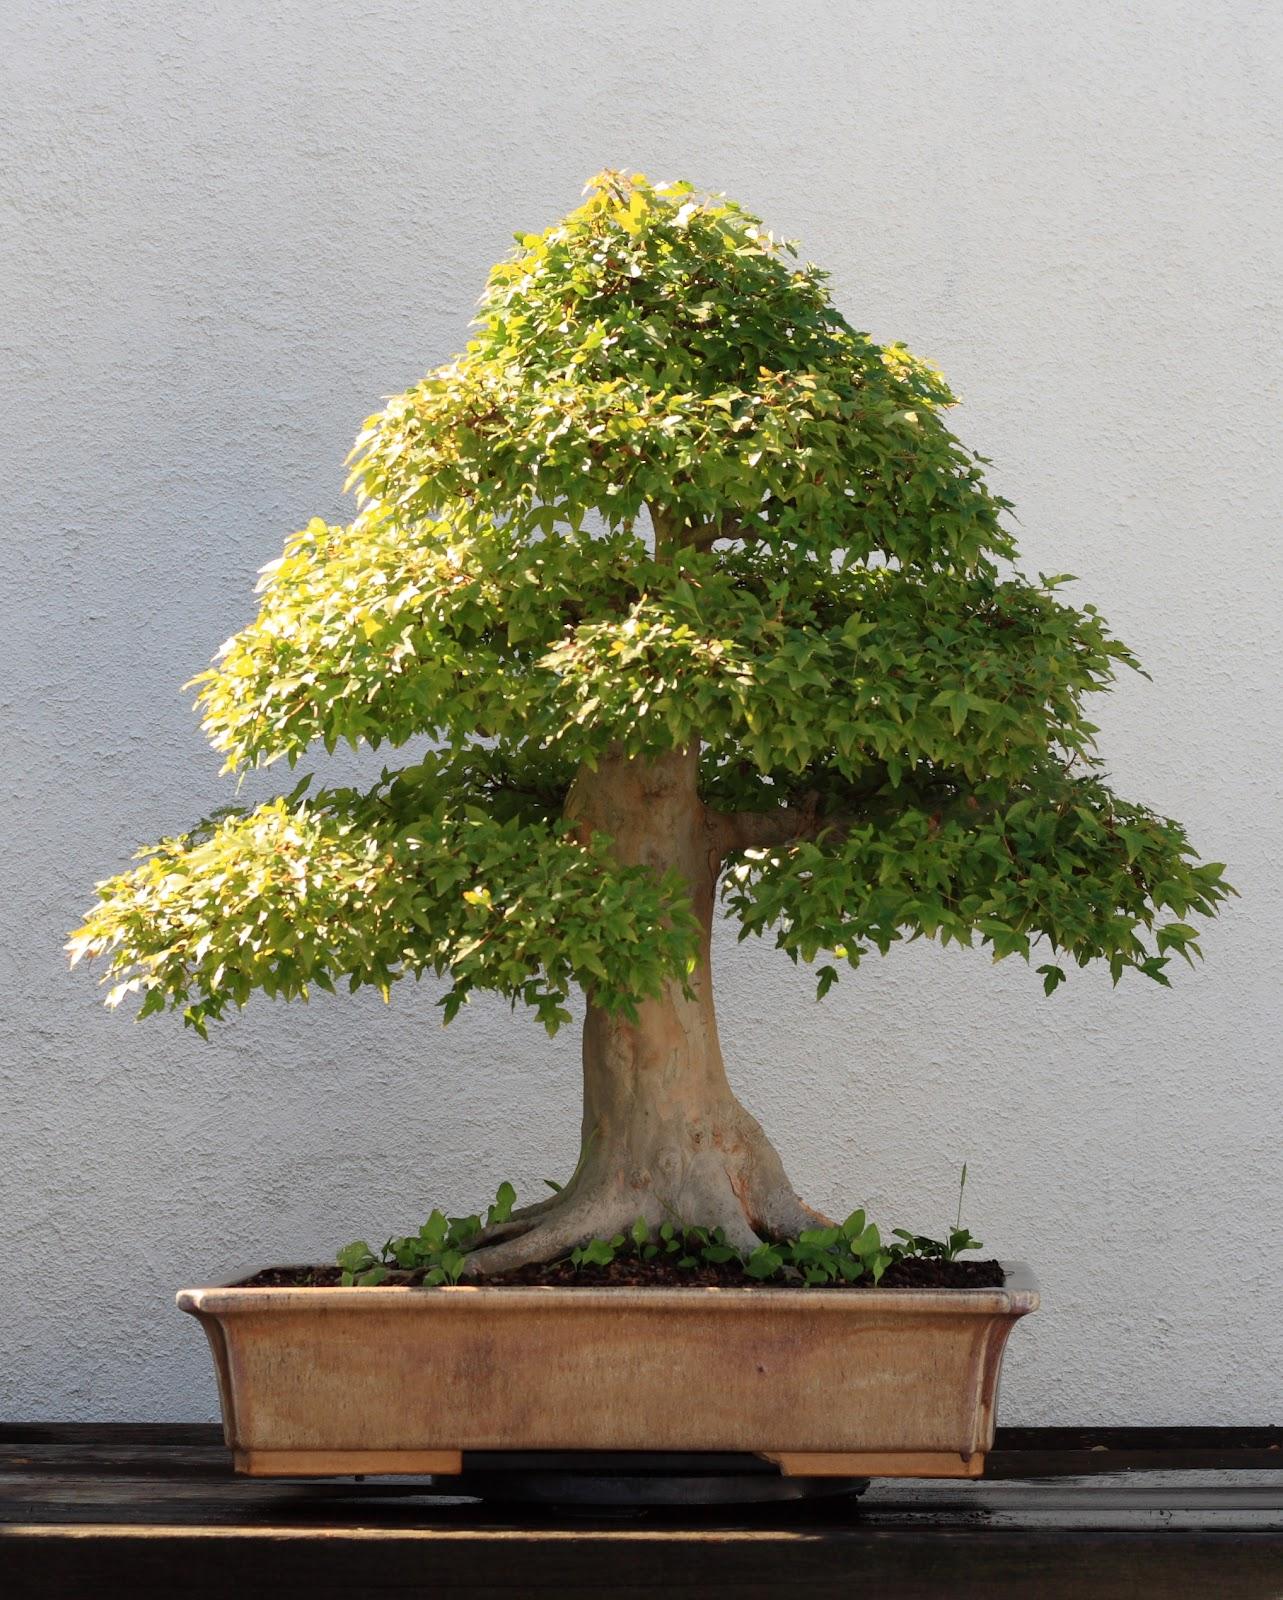 Trident_Maple_bonsai_202,_October_10,_2008.jpg